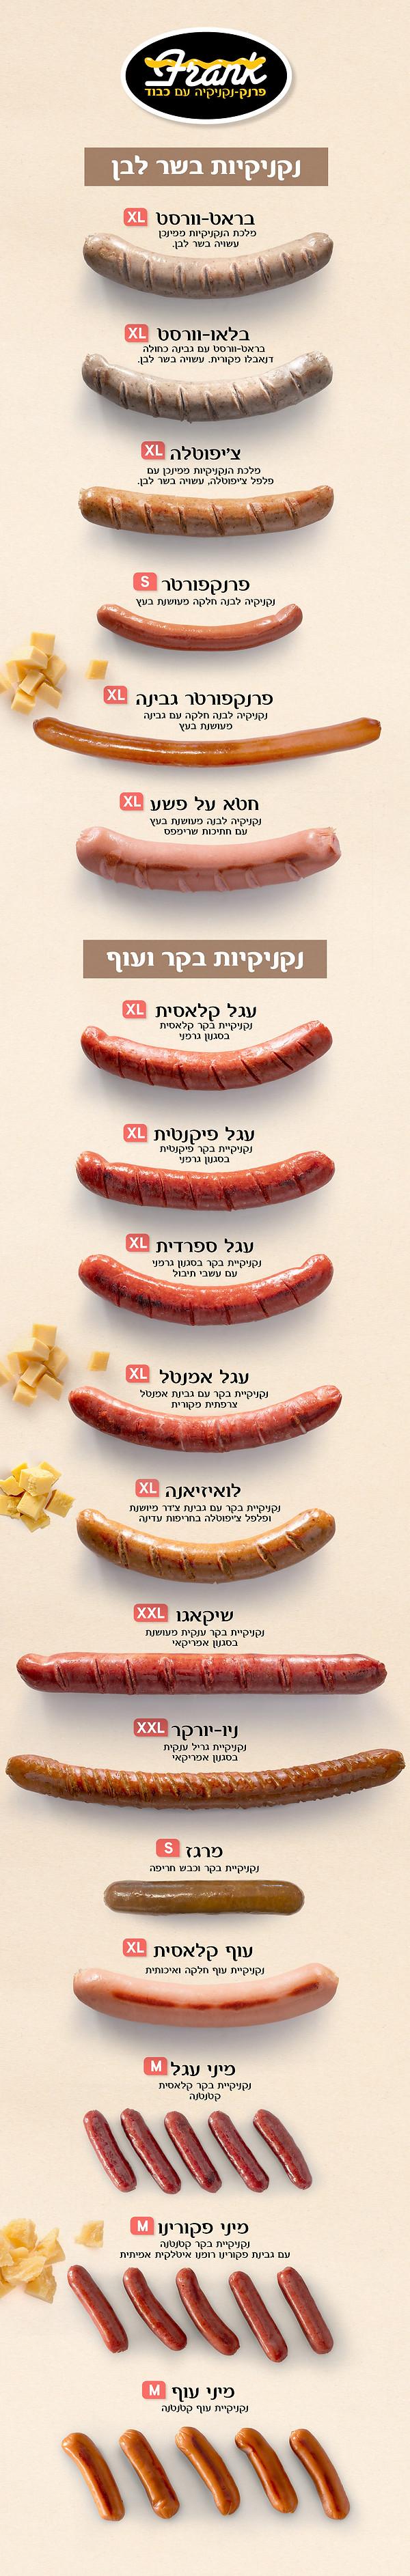 pork_menu.jpg